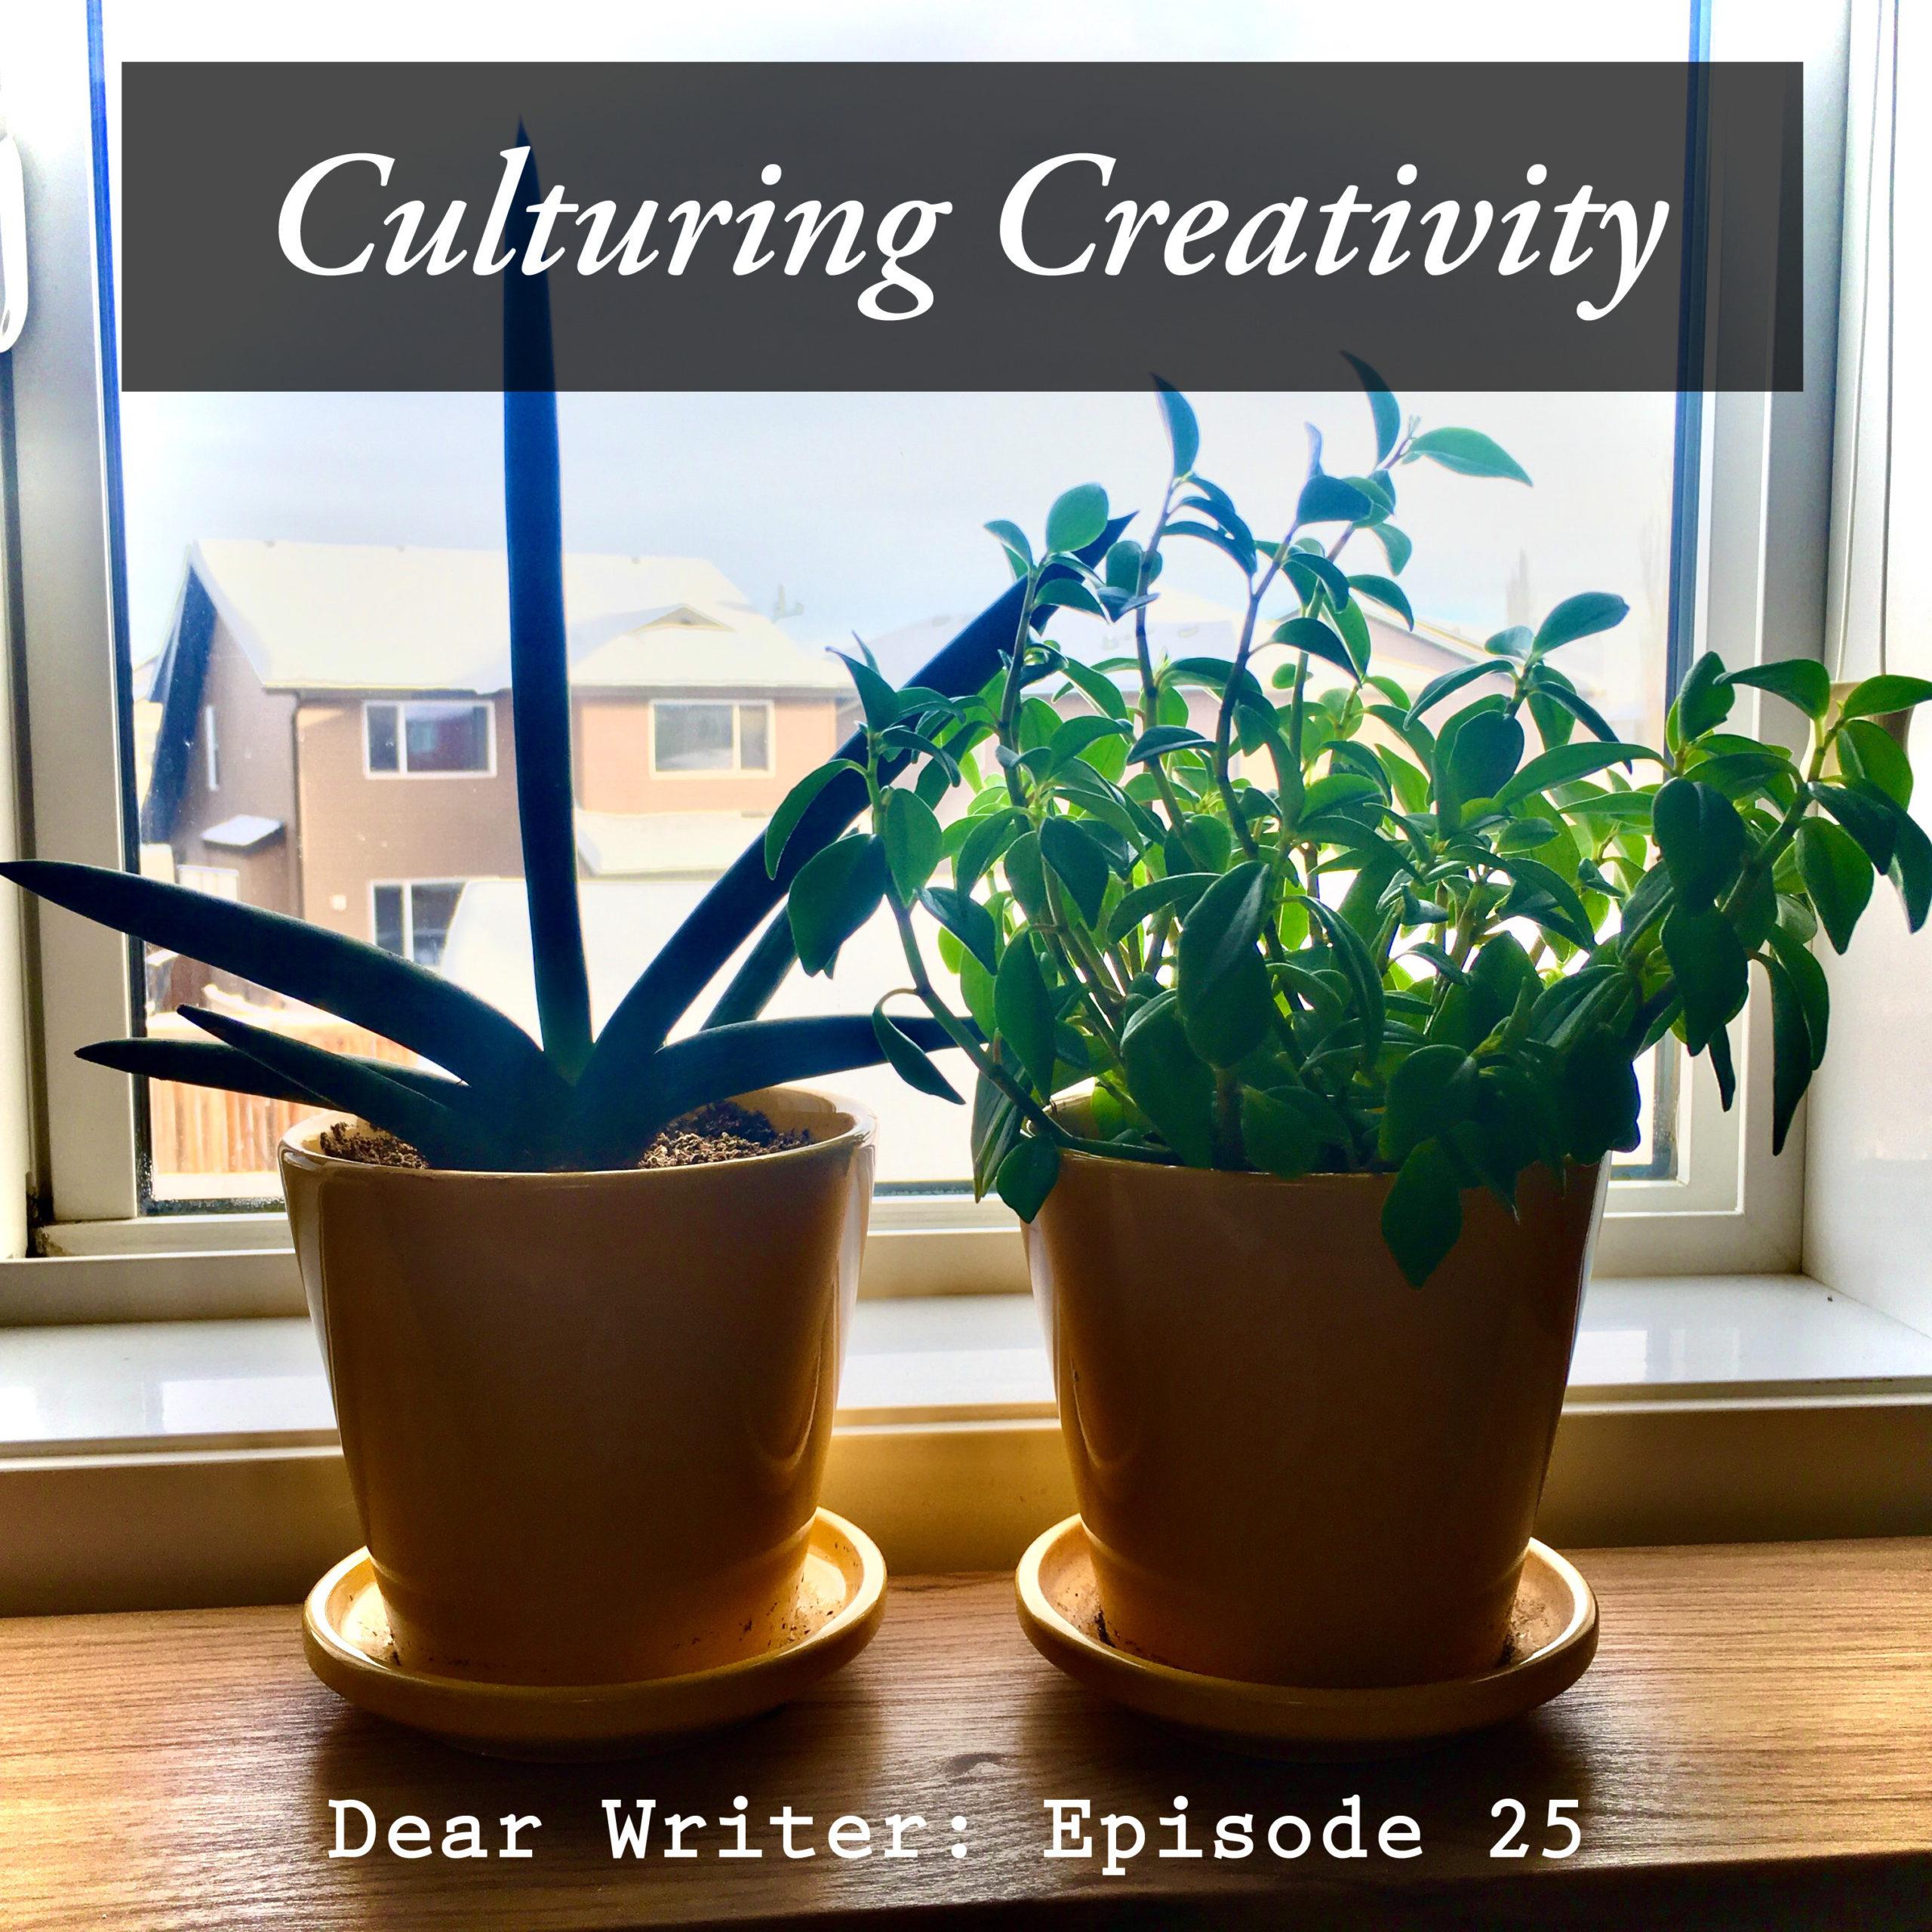 Episode 25: Culturing Creativity - Procrastinating or Propagating?